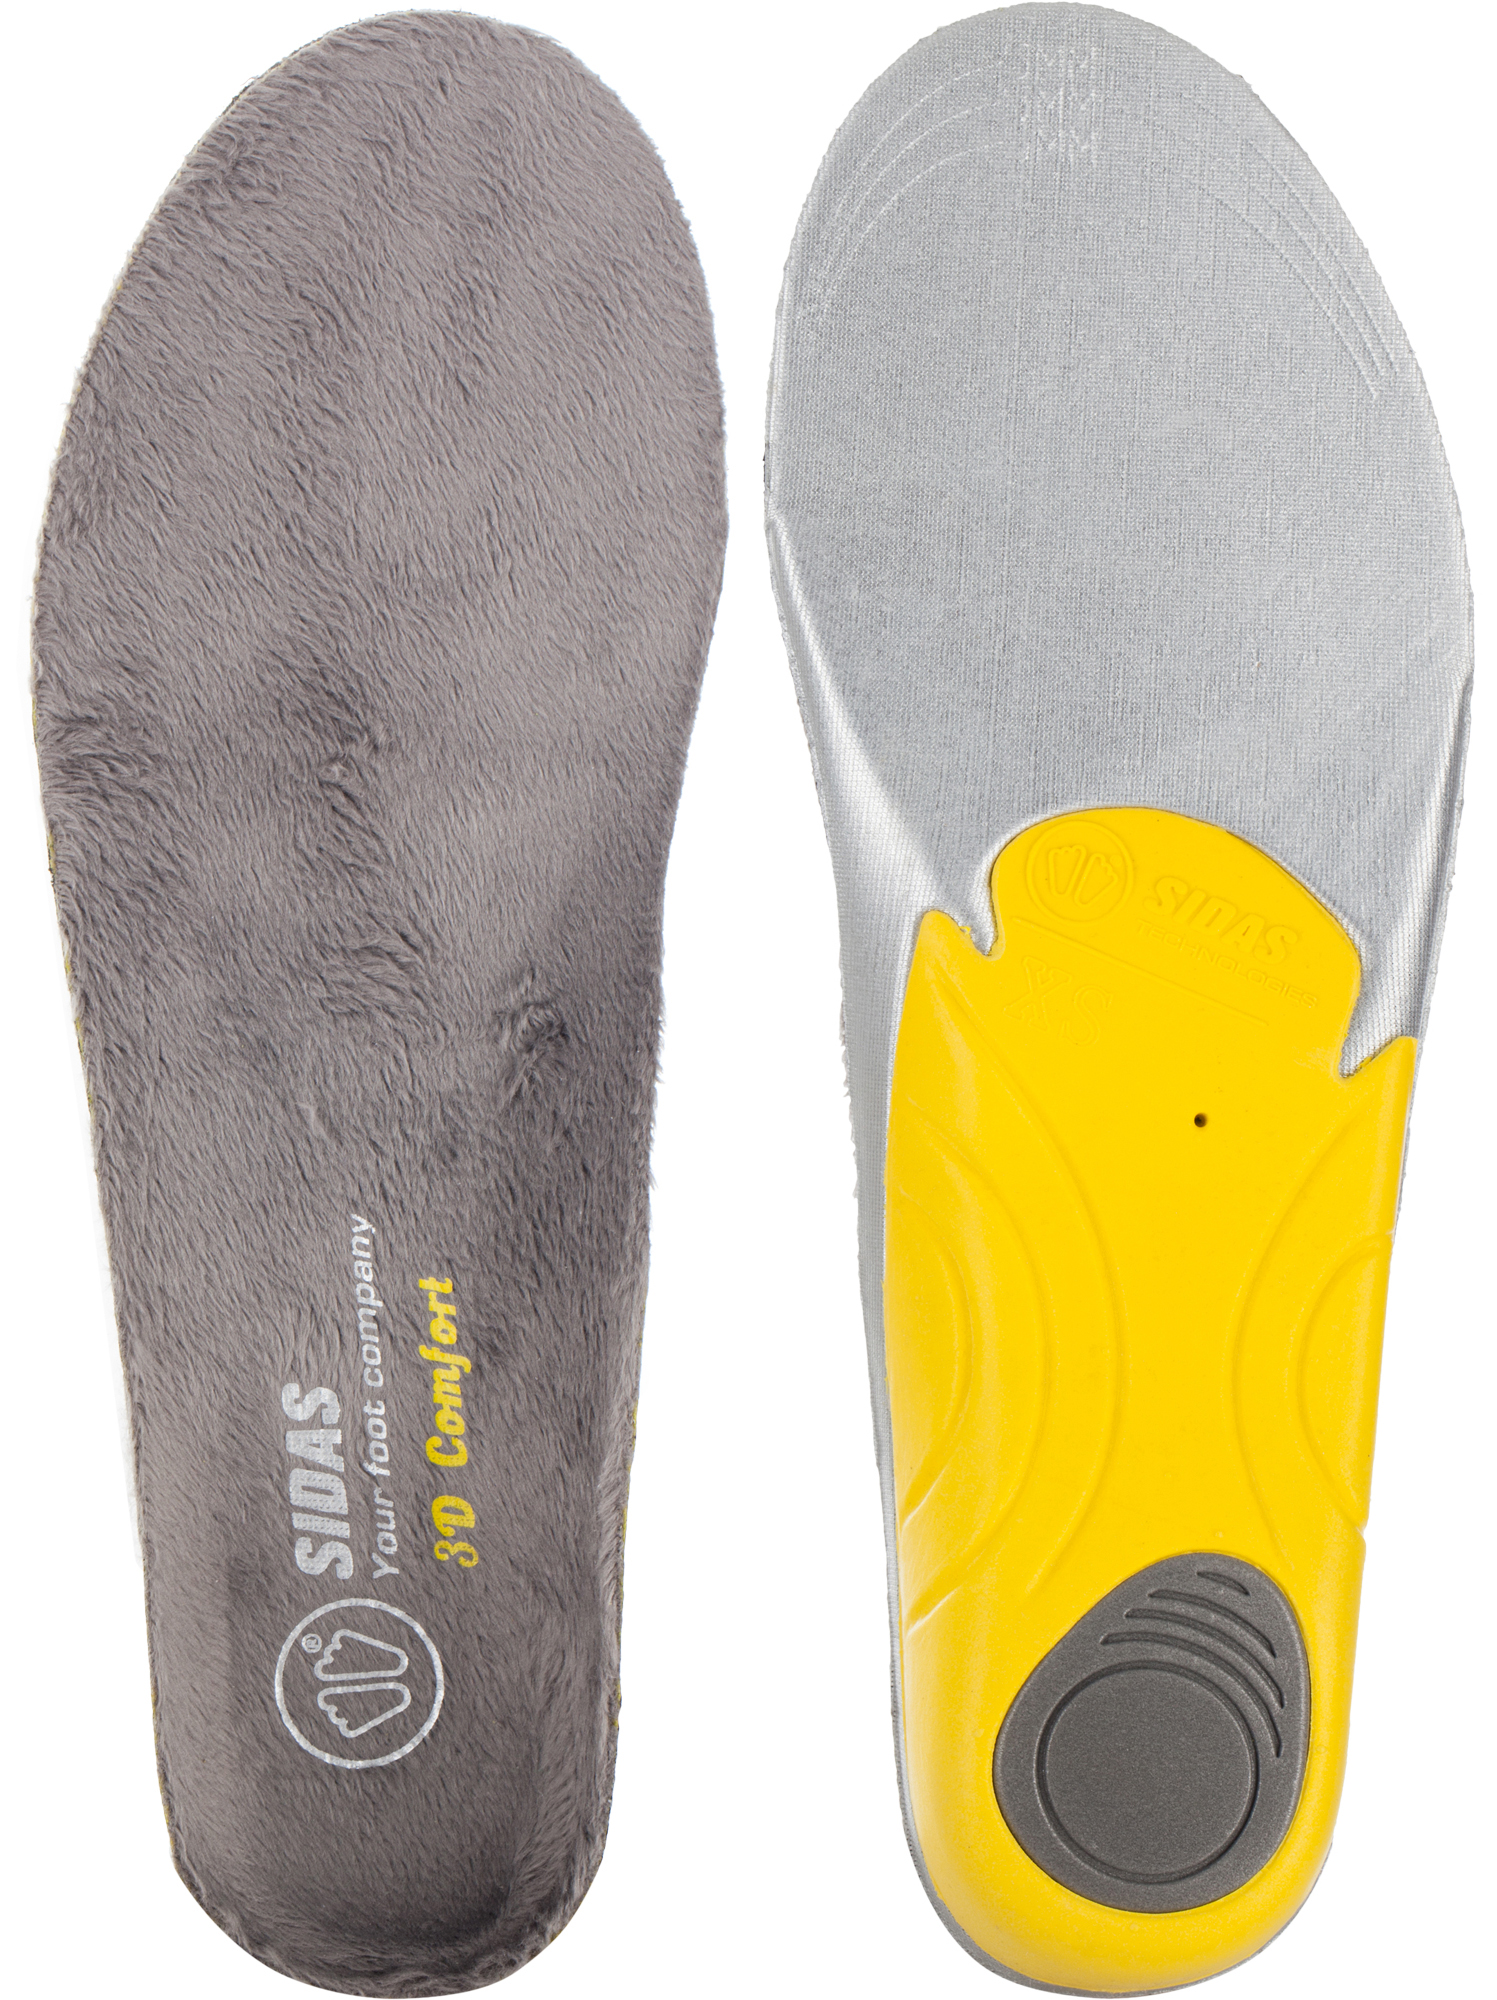 Sidas Стельки Sidas Winter 3D стельки формируемые sidas custom ski prem xl